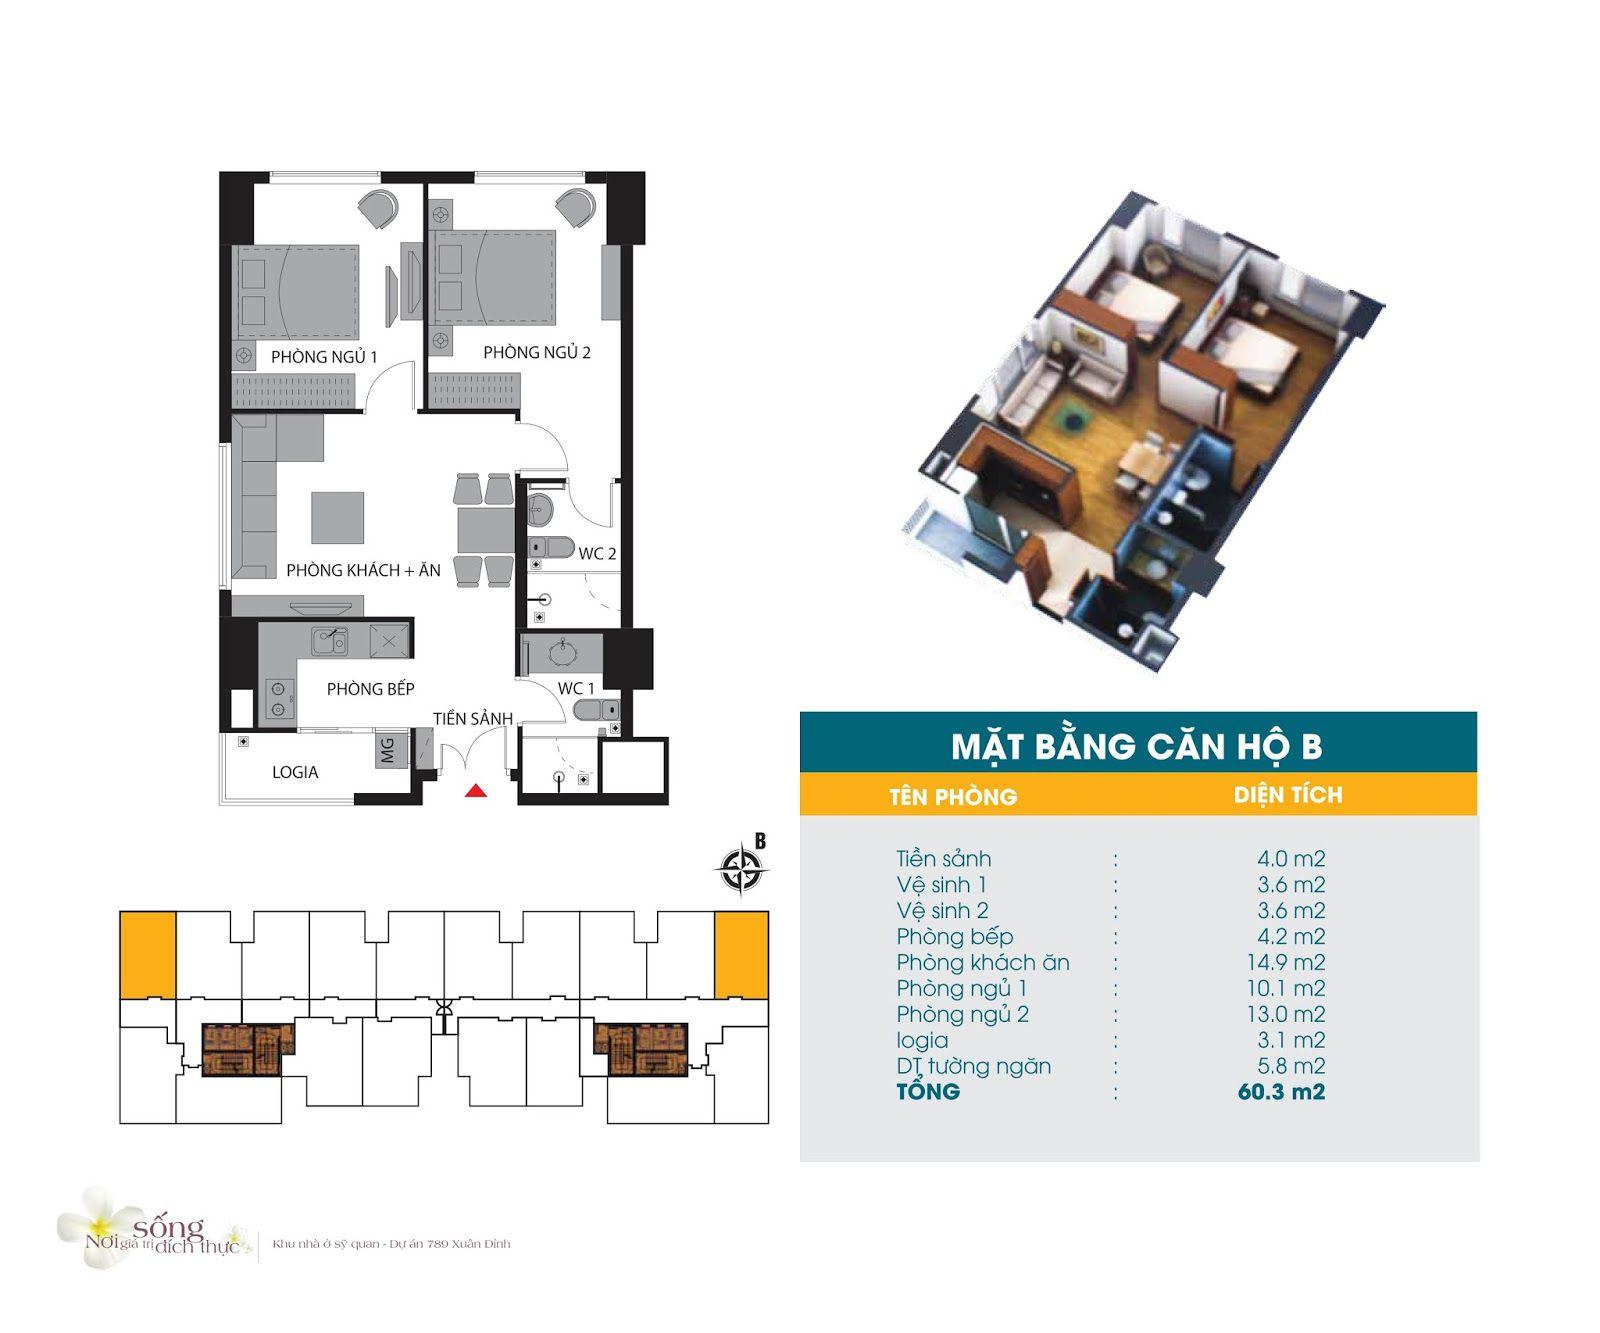 Căn hộ 60,3 m2